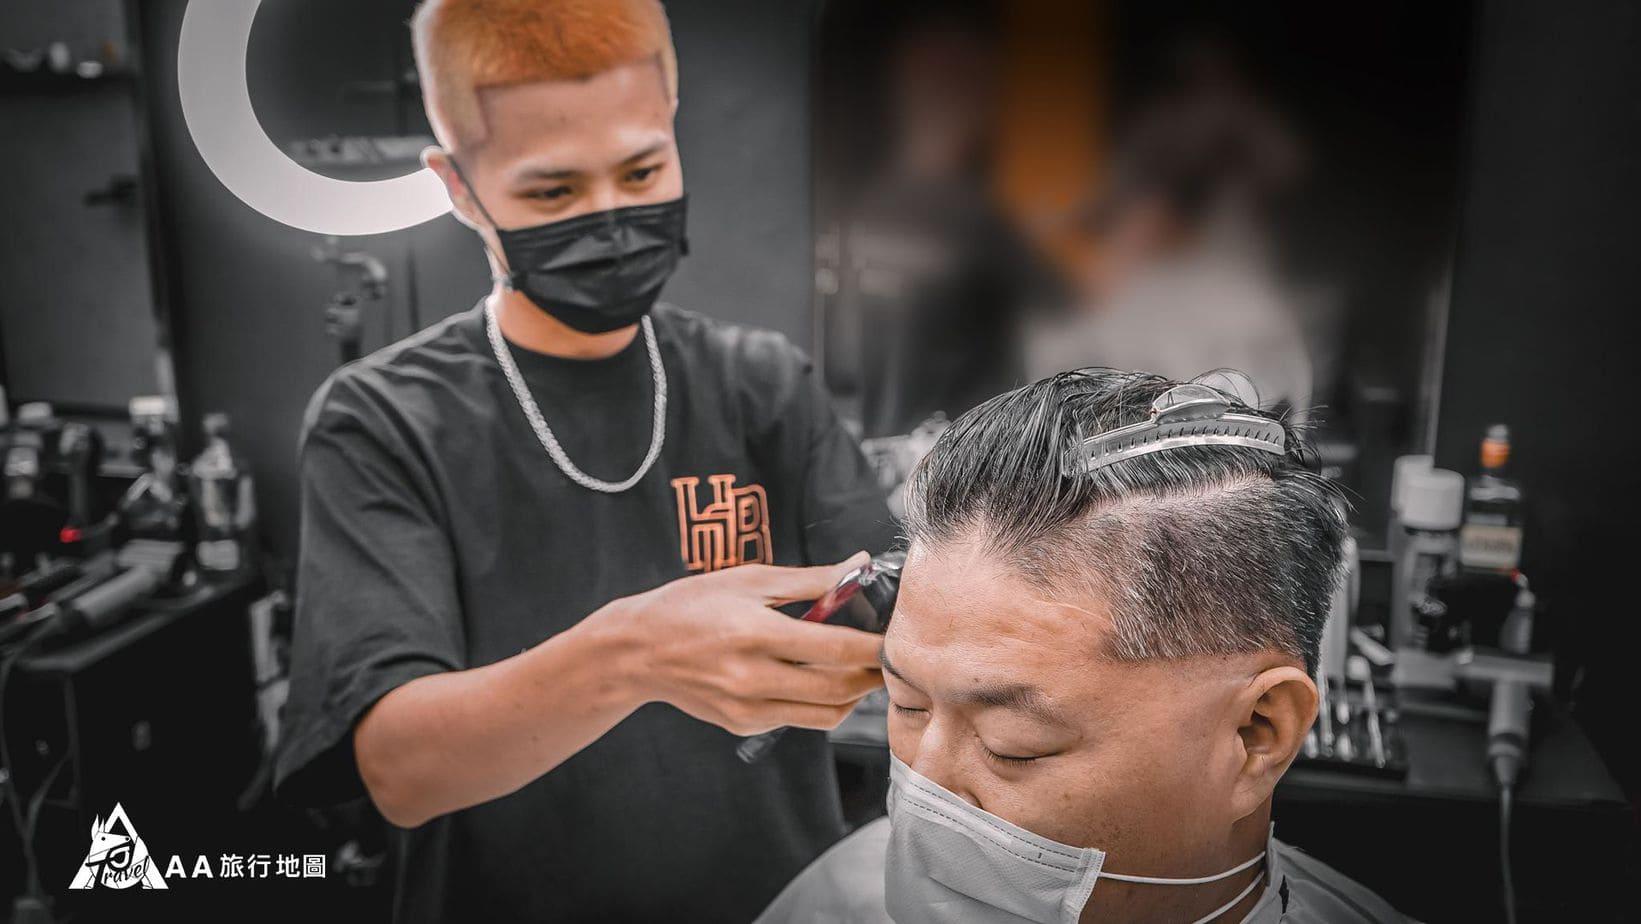 HomeComing 理髮師用心剪,我們就靜靜享受這短暫的放鬆